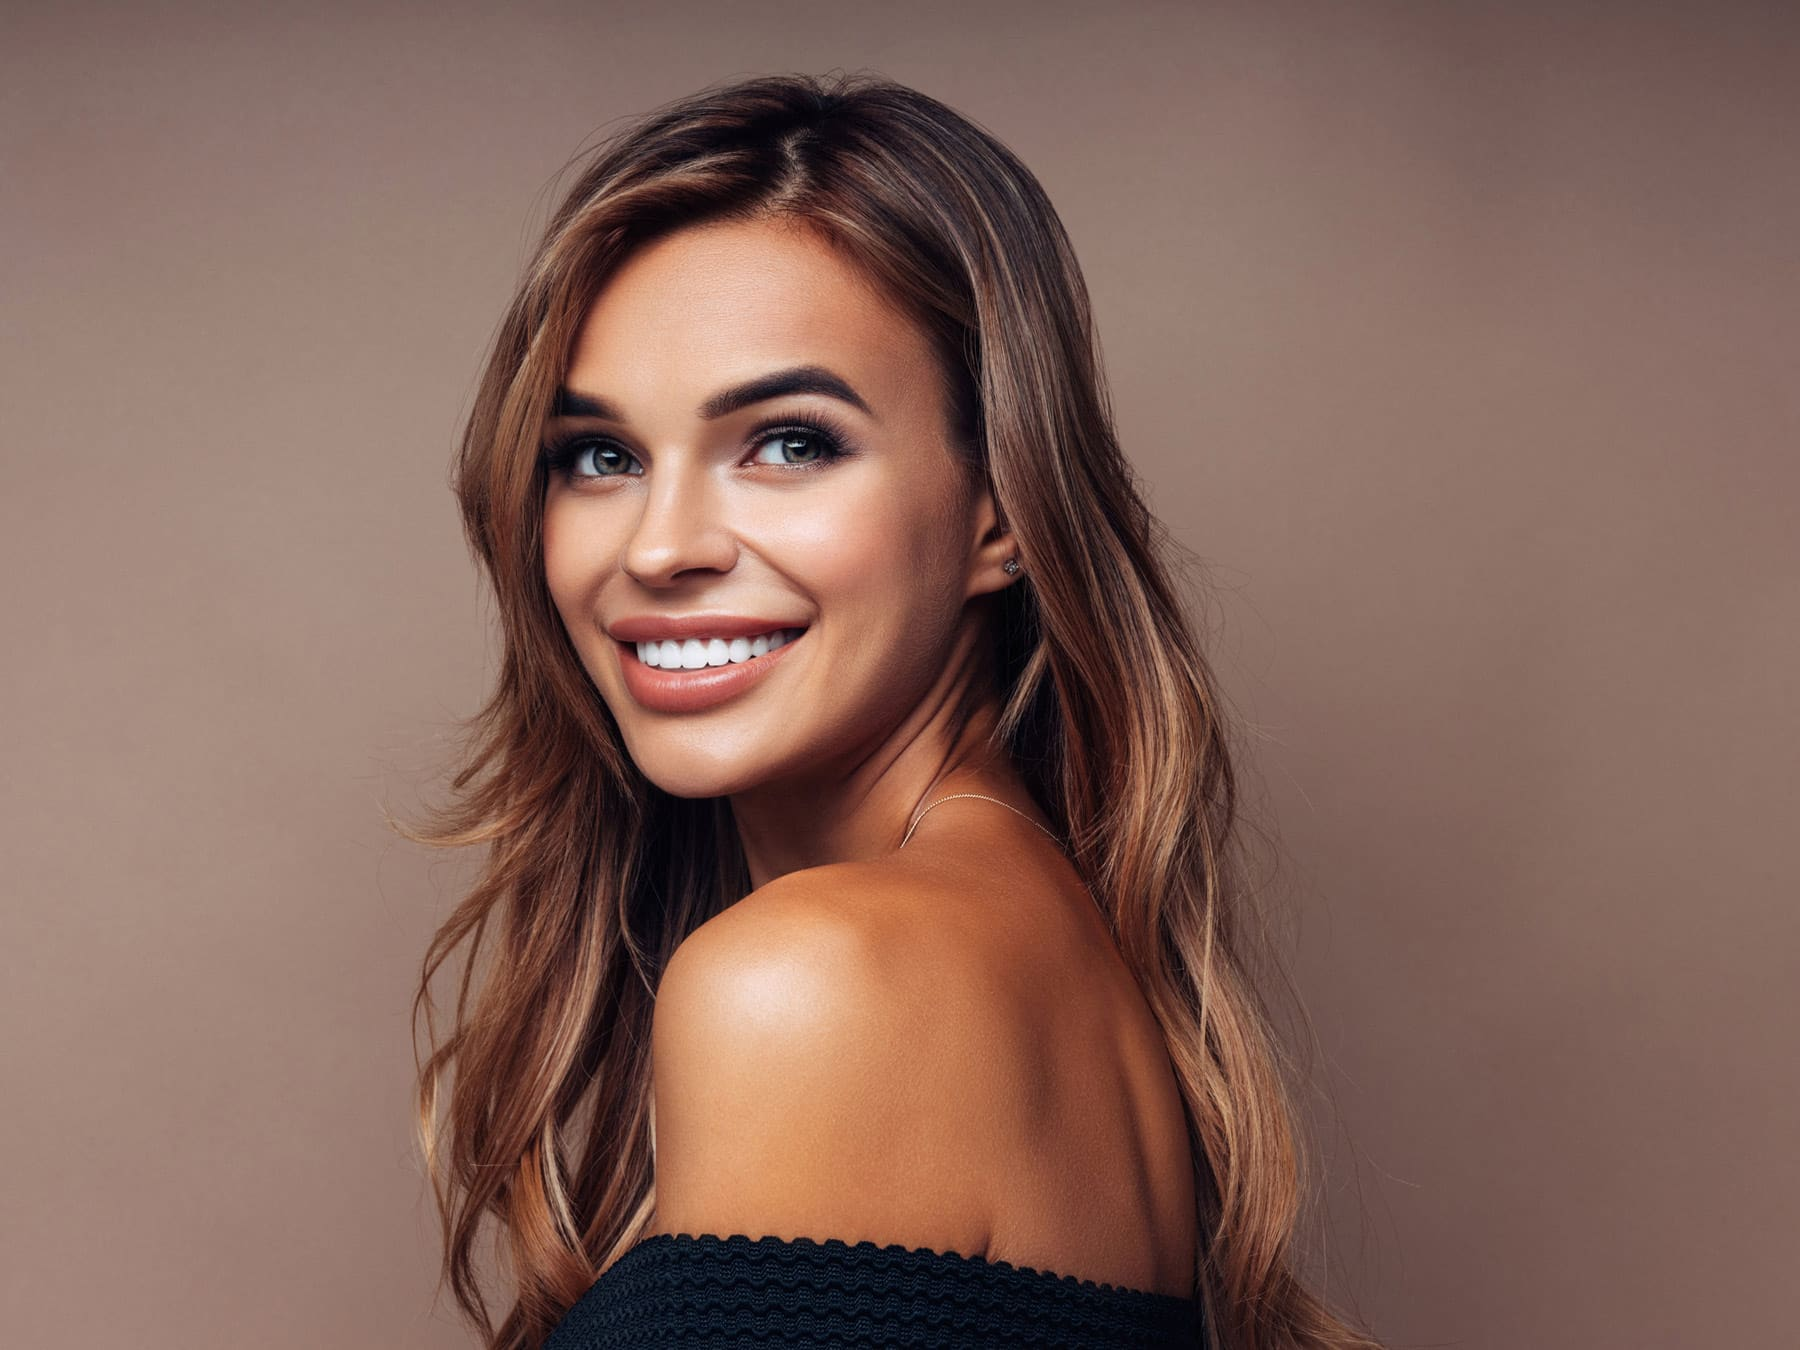 Bonding - Clearwater Smiles Dentistry